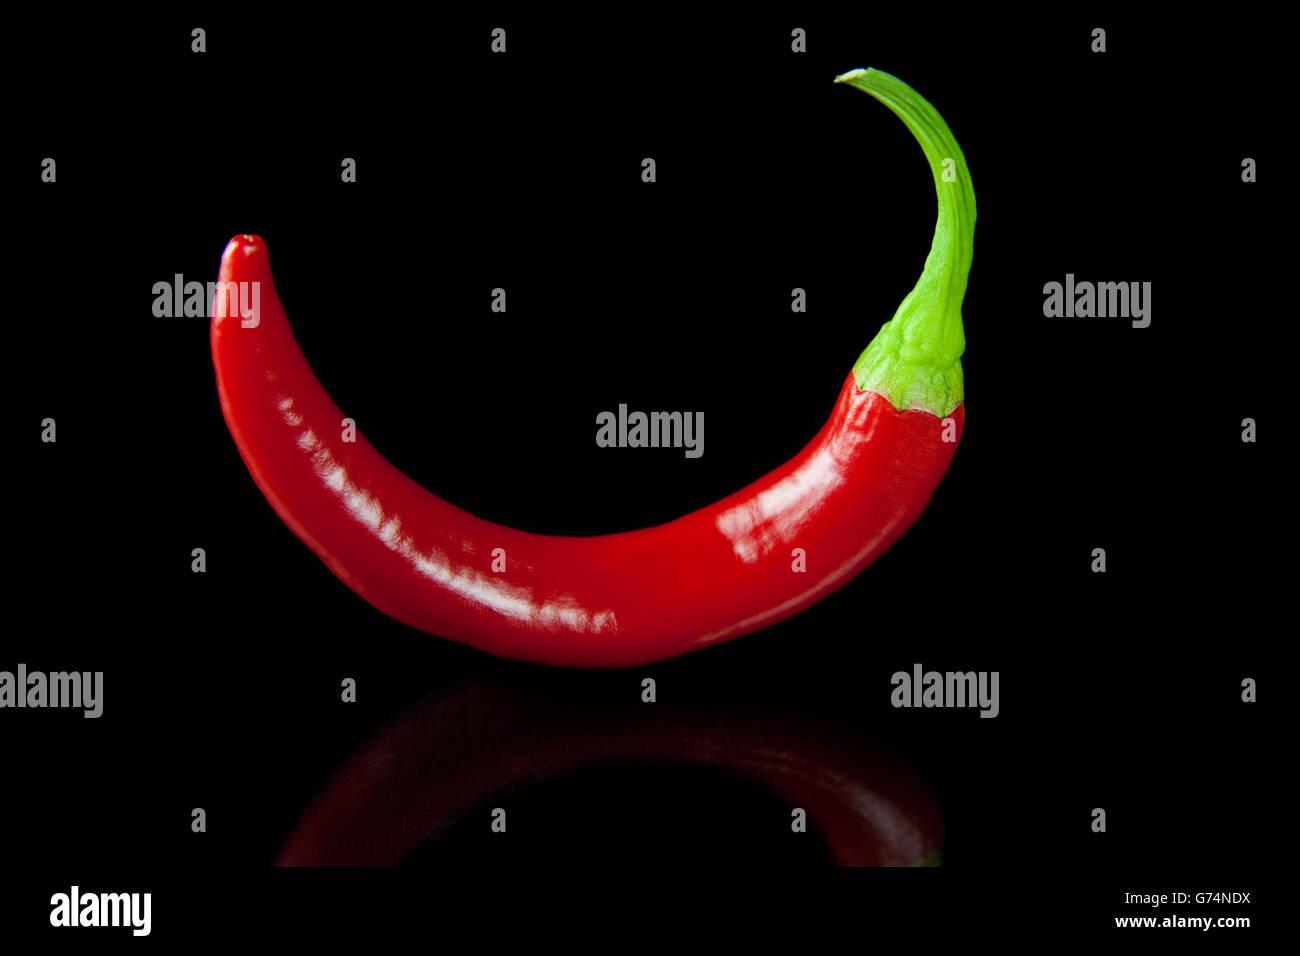 Red hot chili pepper Photo Stock